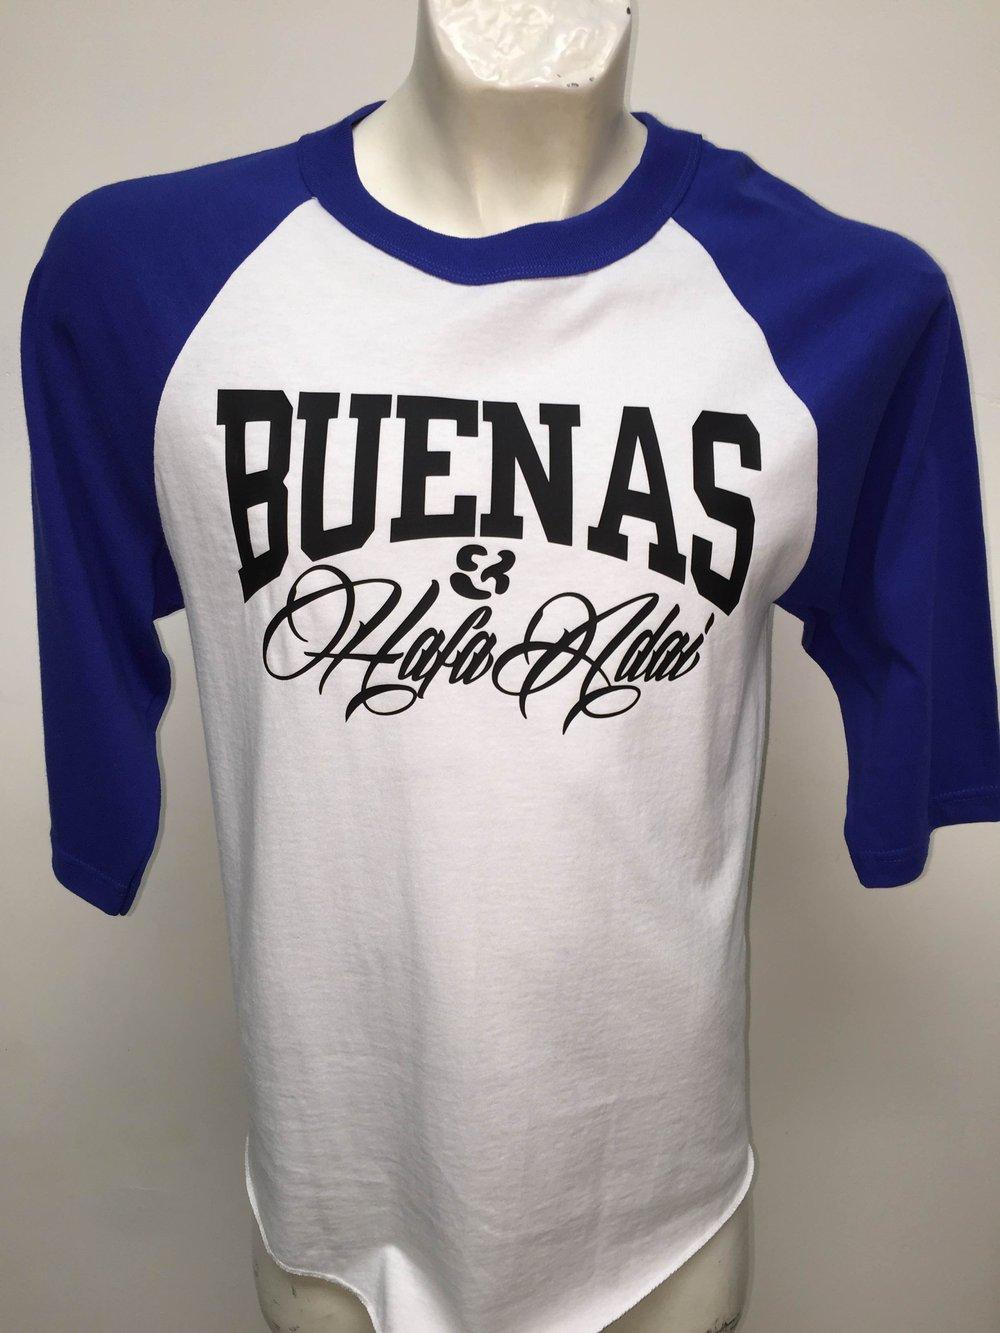 Image of Buenas & Hafa Adai Original (White/Blue)